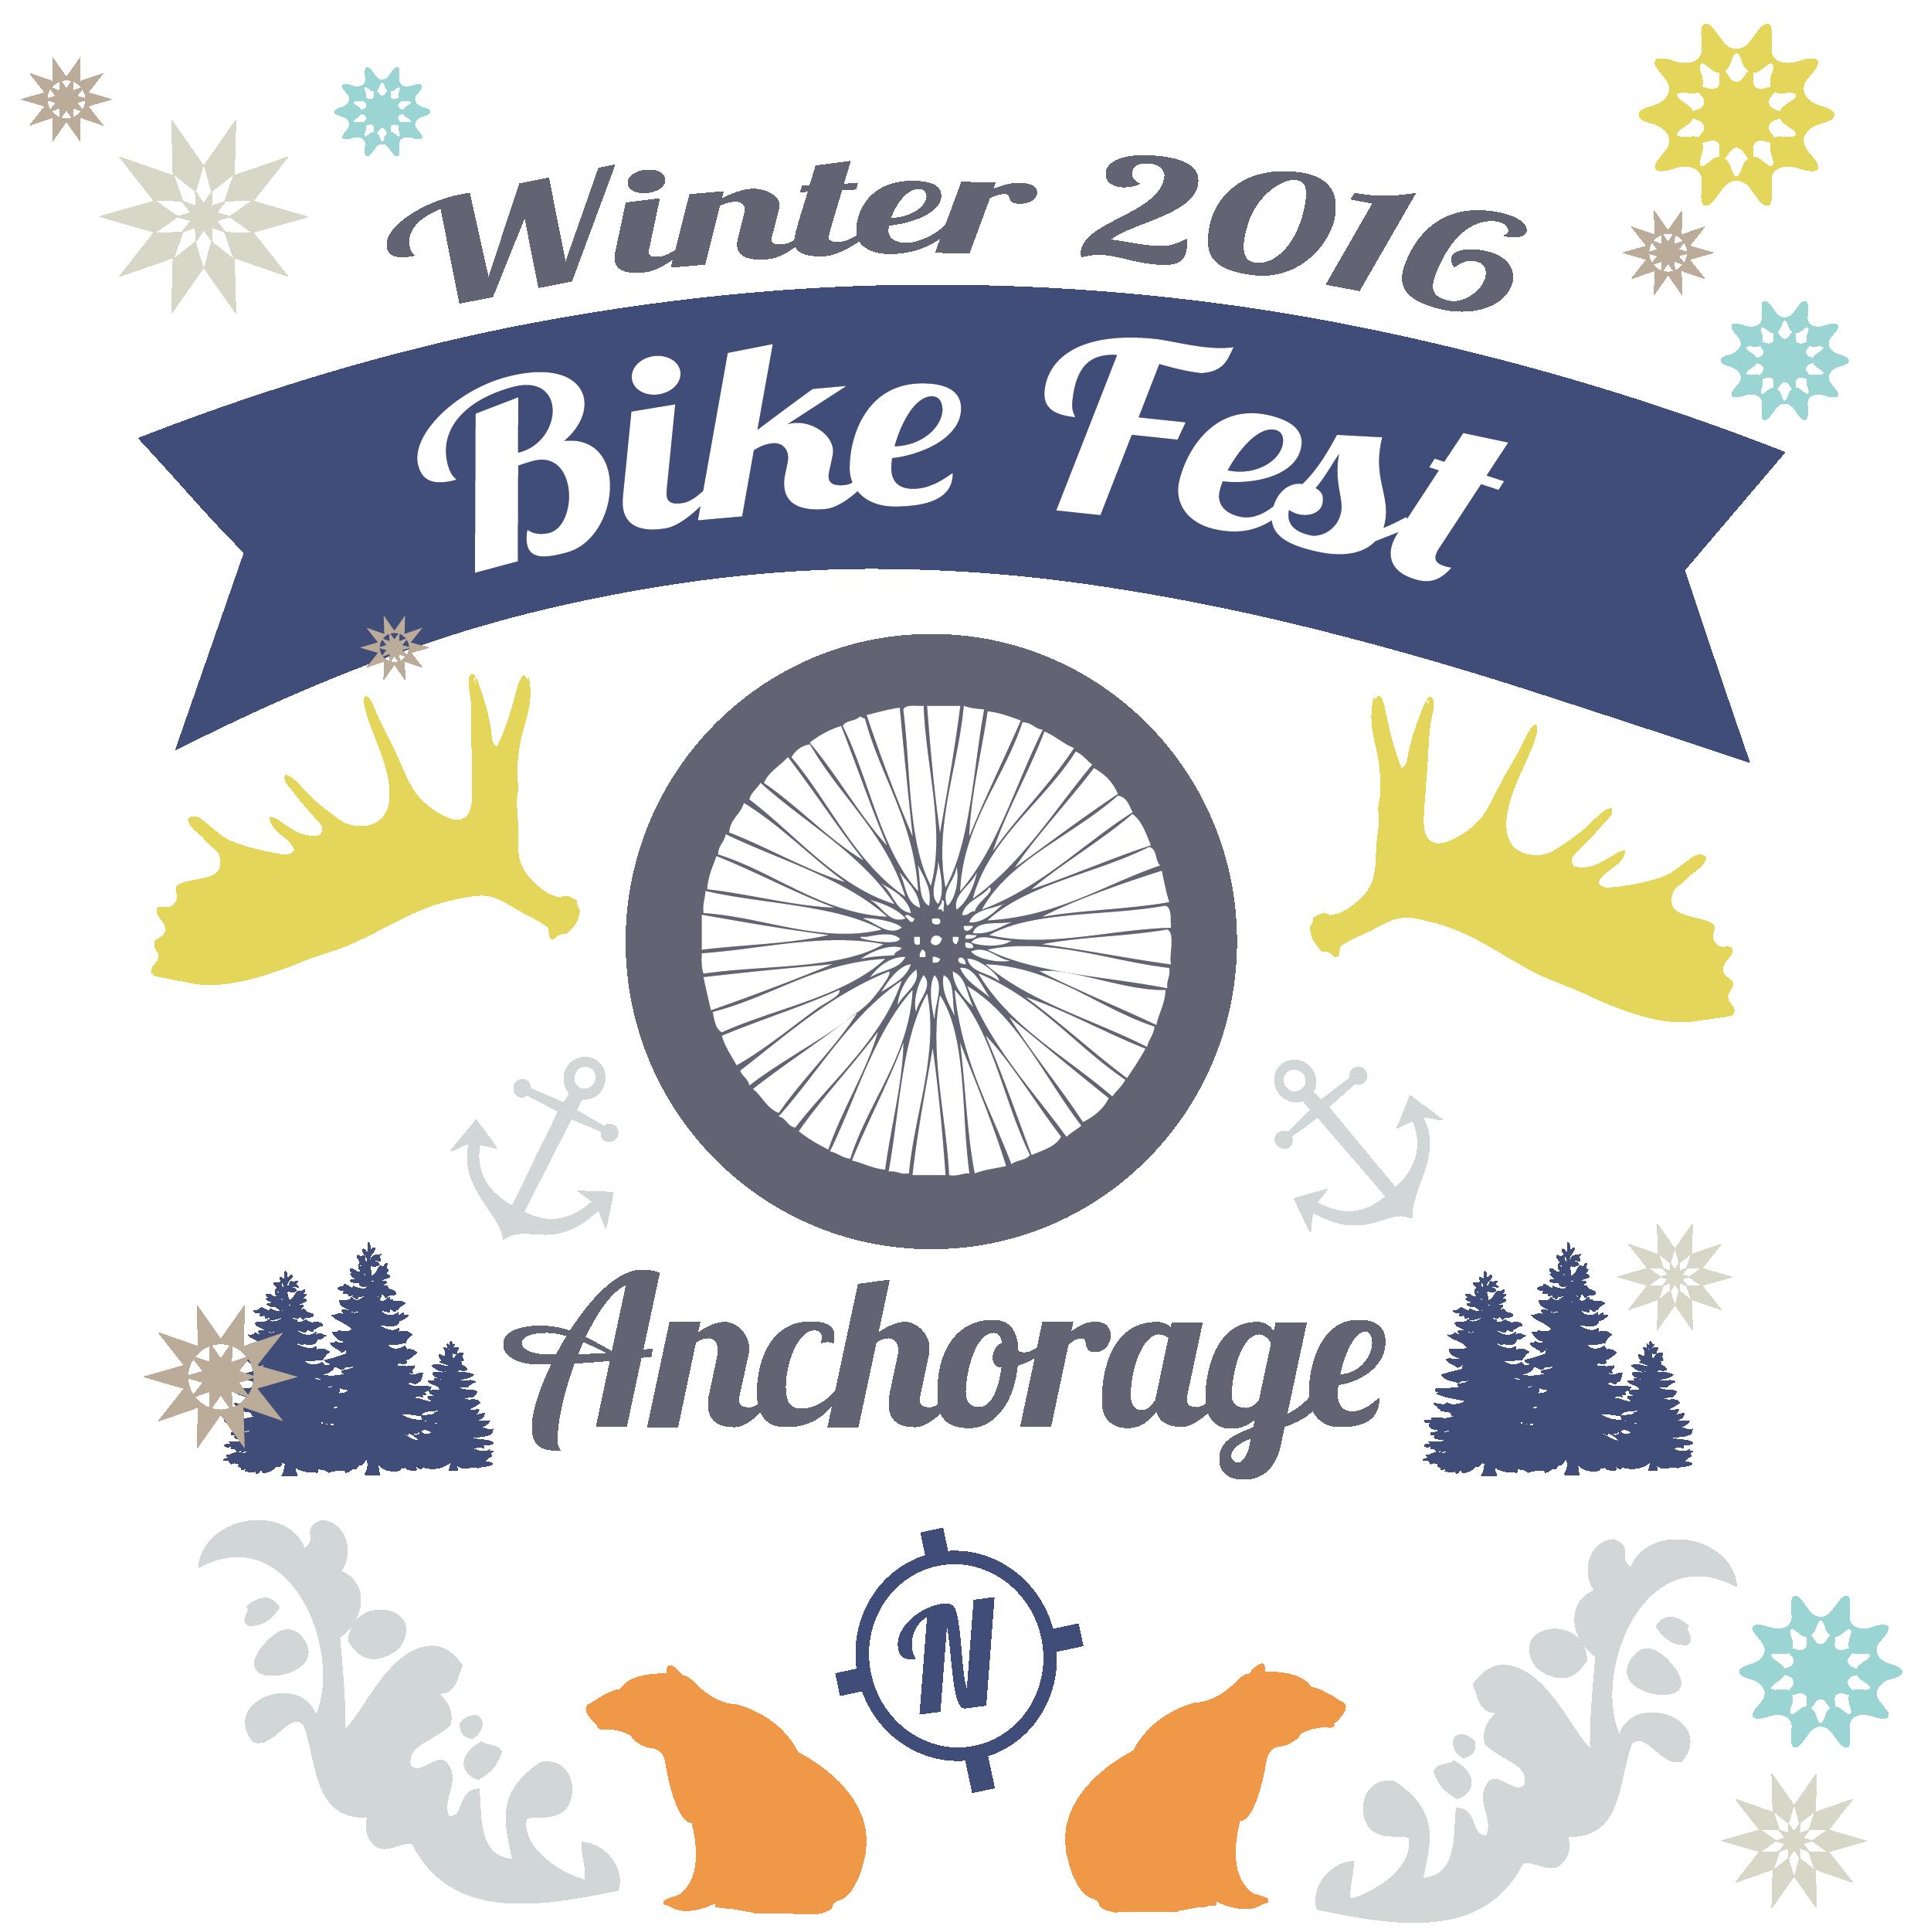 2016Winterbikefestposter-02.png